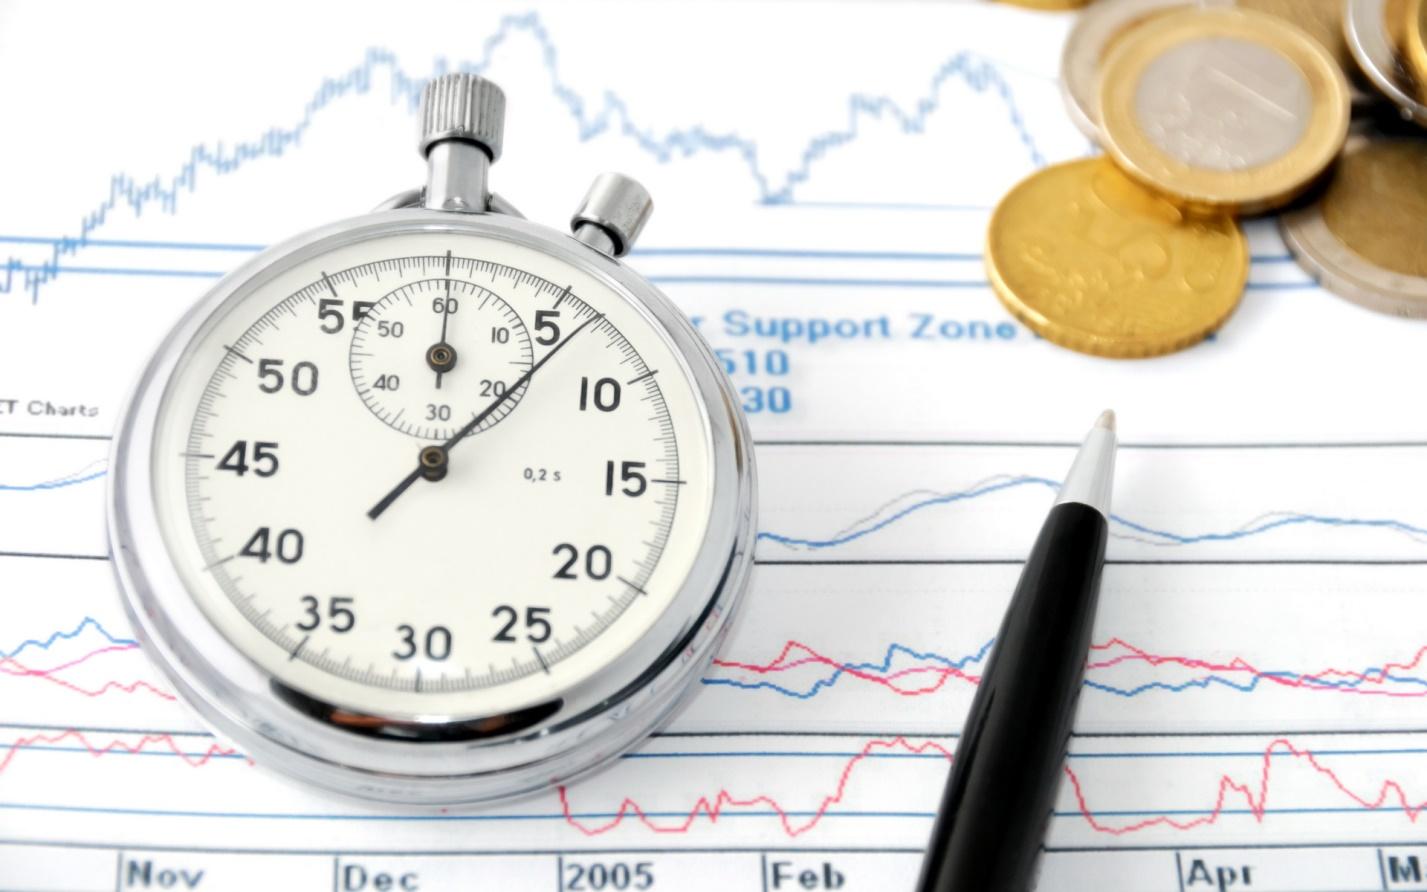 Трендовые закономерности на валютном рынке